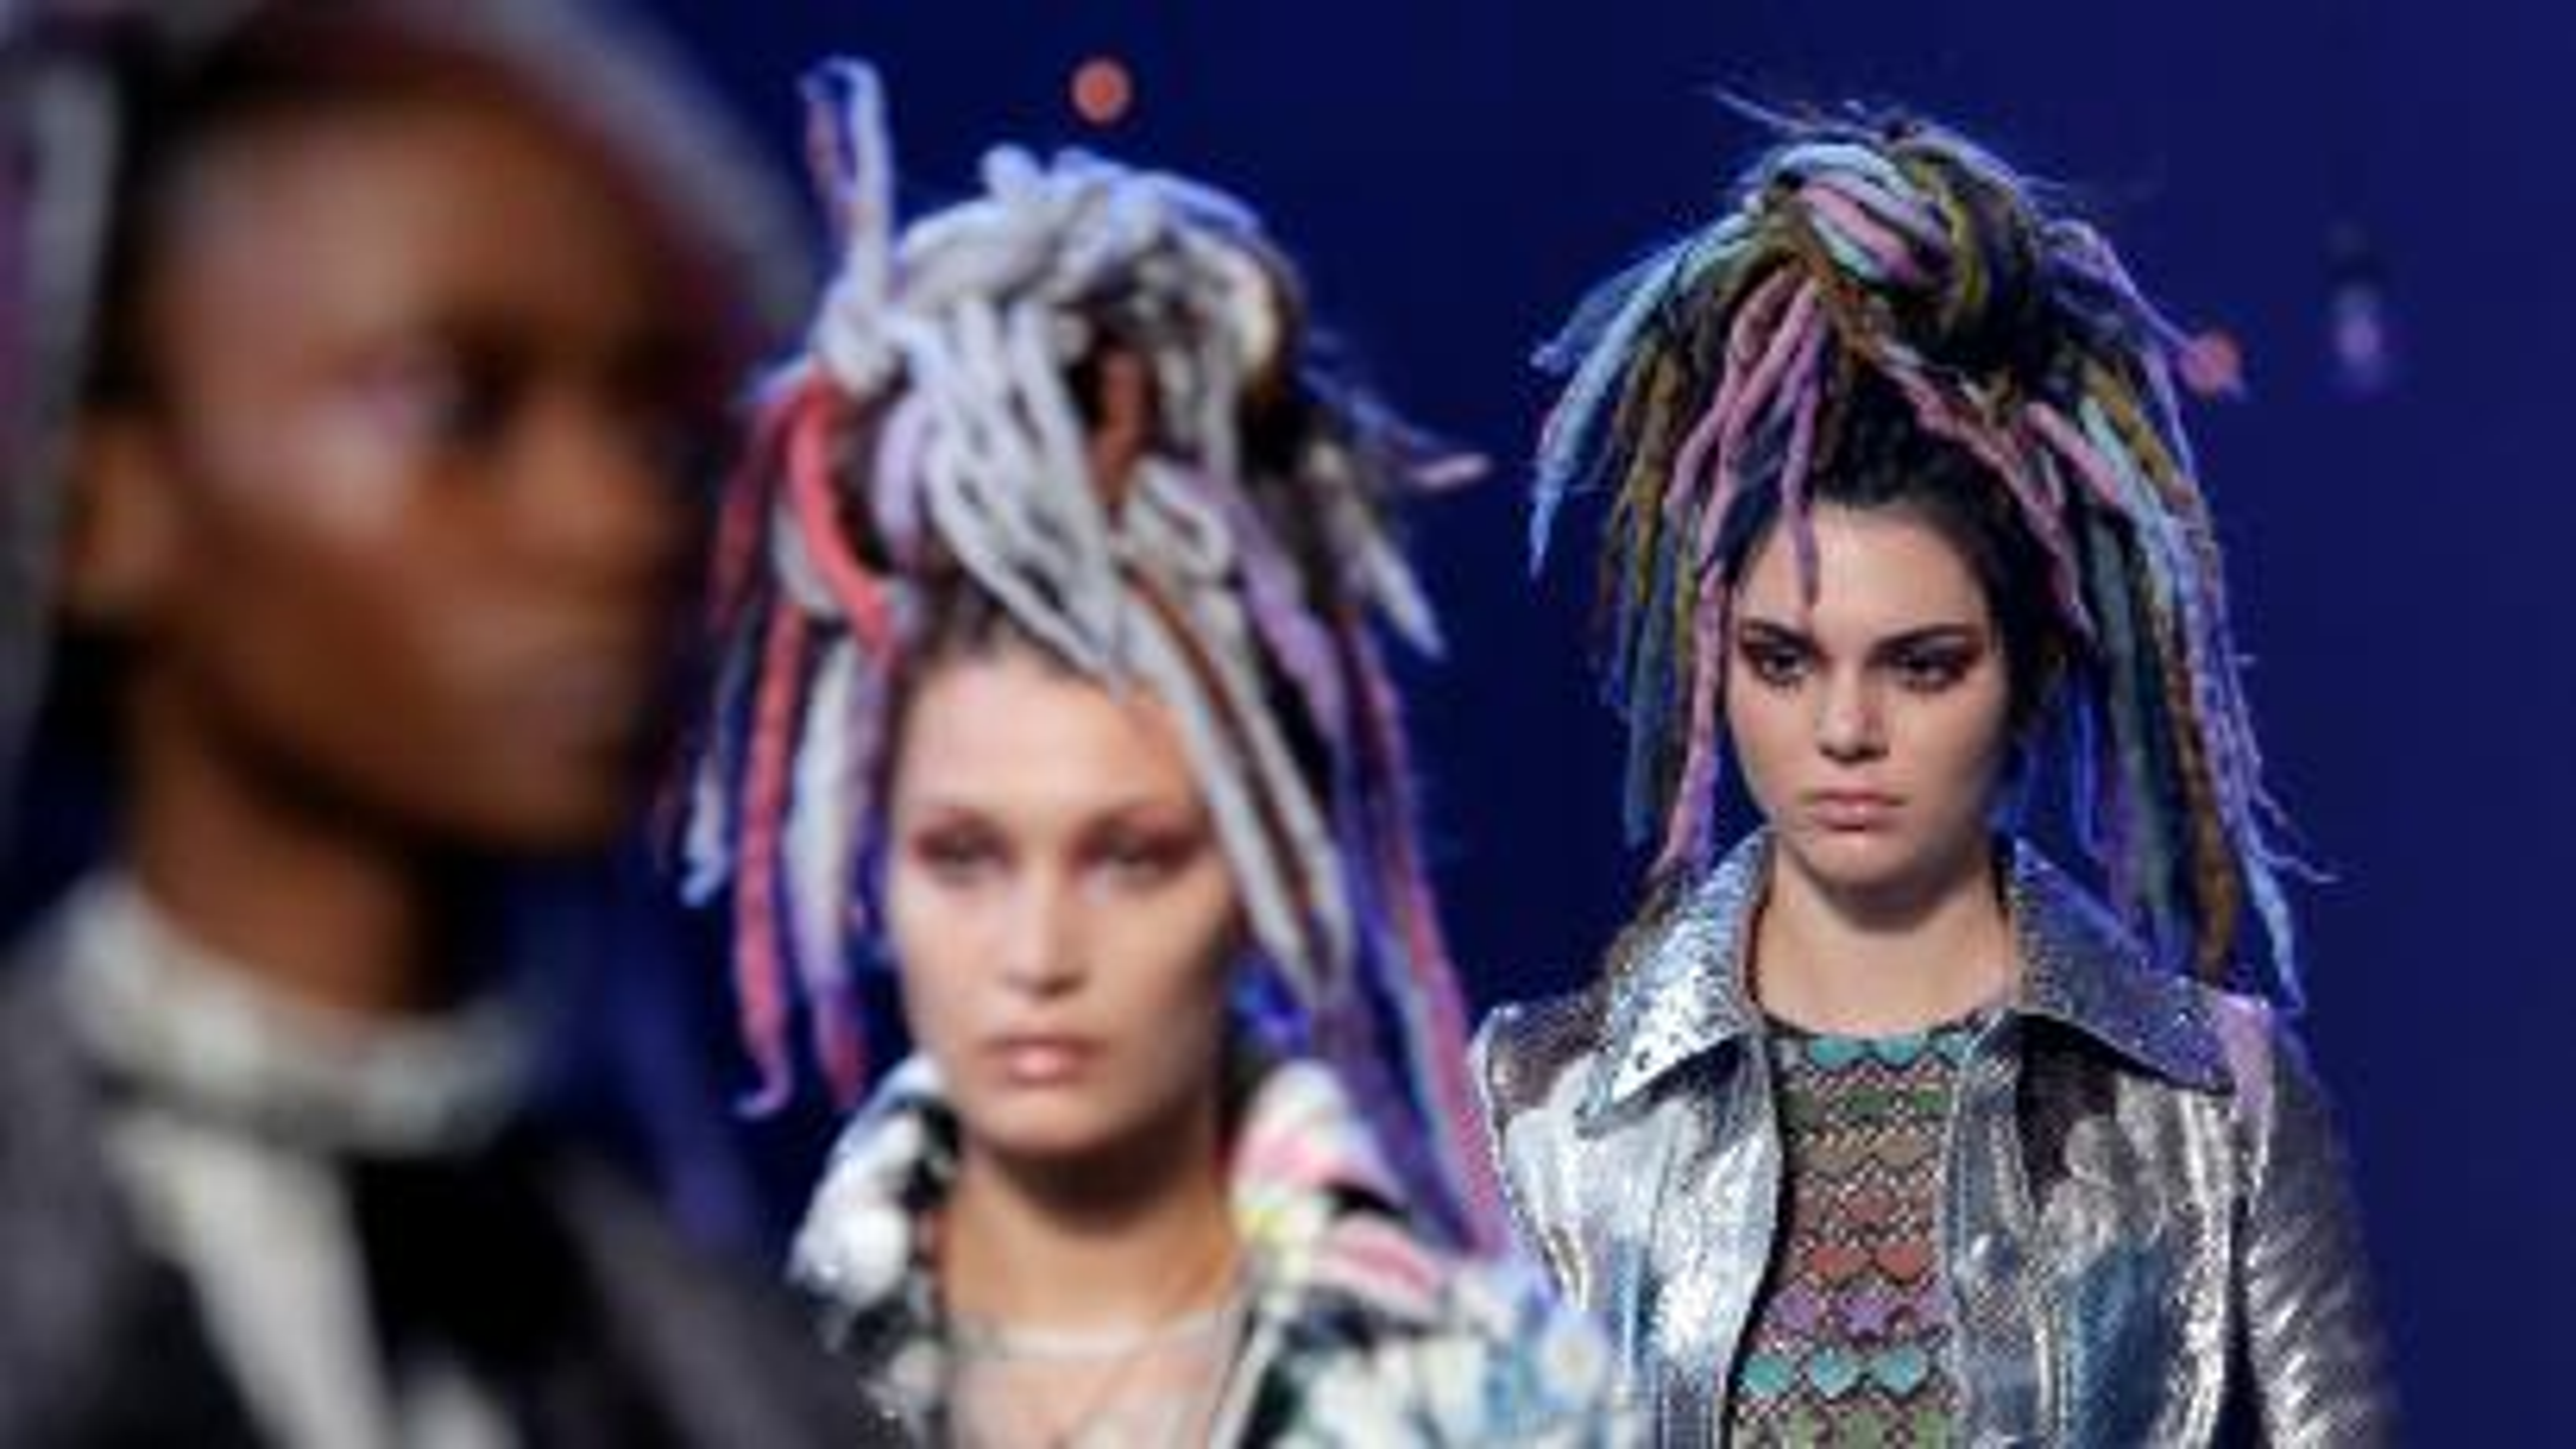 marc jacobs, fashion week, dreadlocks, cultural appropriation